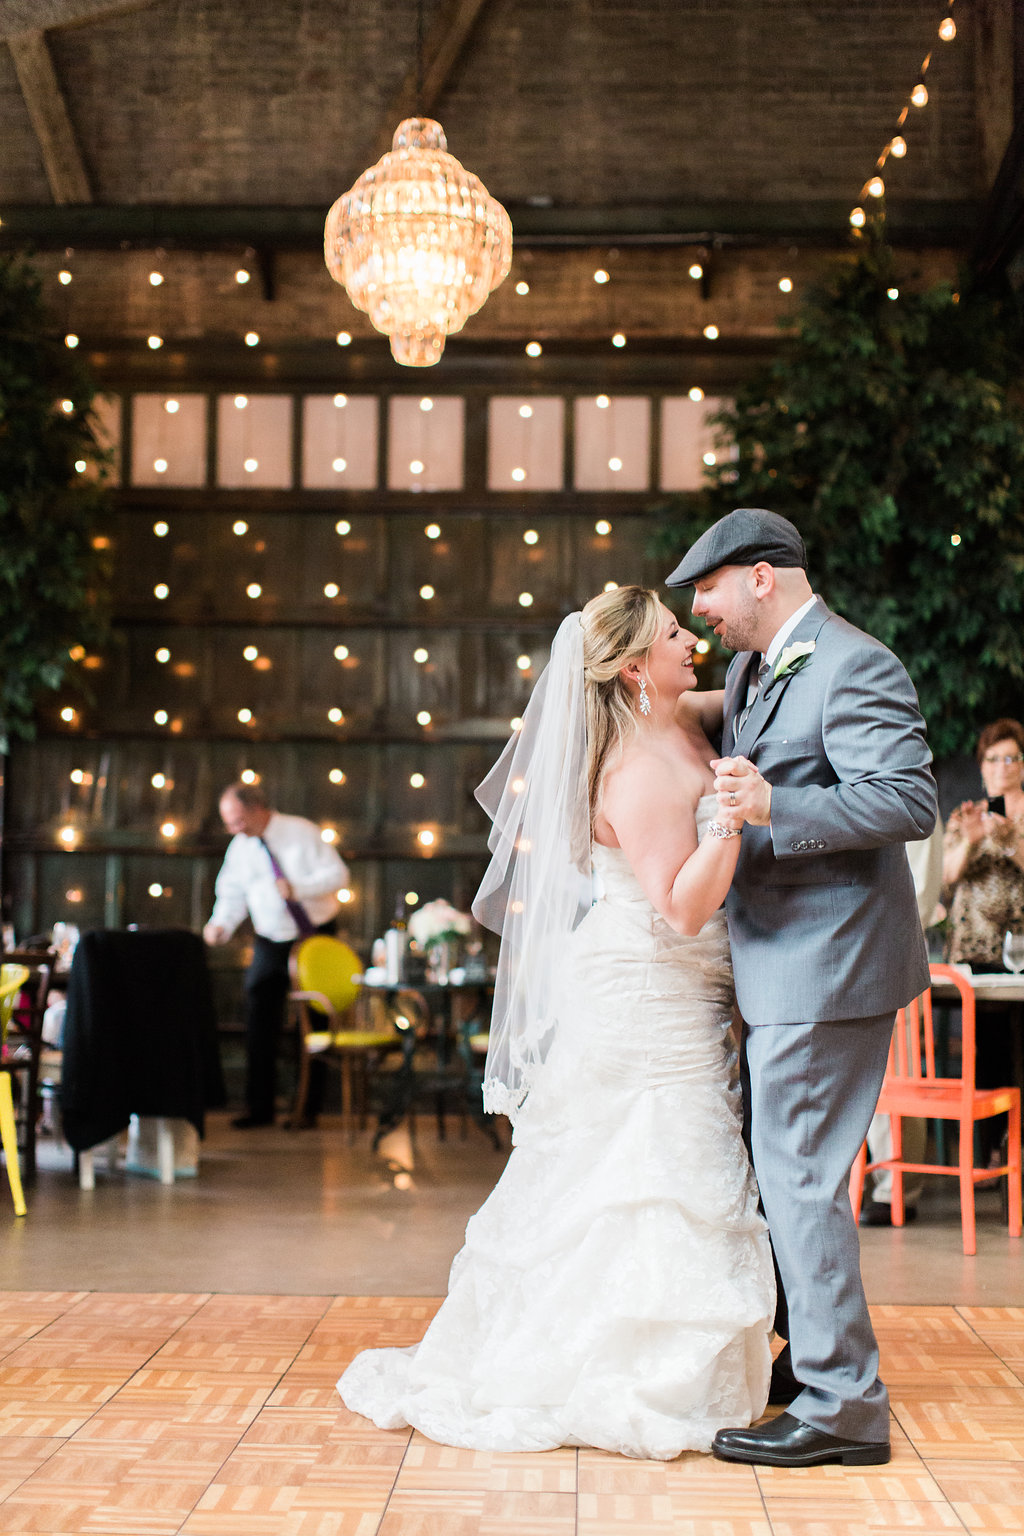 kristin-and-darren-wedding-soho-south-cafe-wormsloe-apt-b-photography-savannah-wedding-planner-savannah-weddings-southern-weddings-best-savannah-wedding-planner-32.JPG